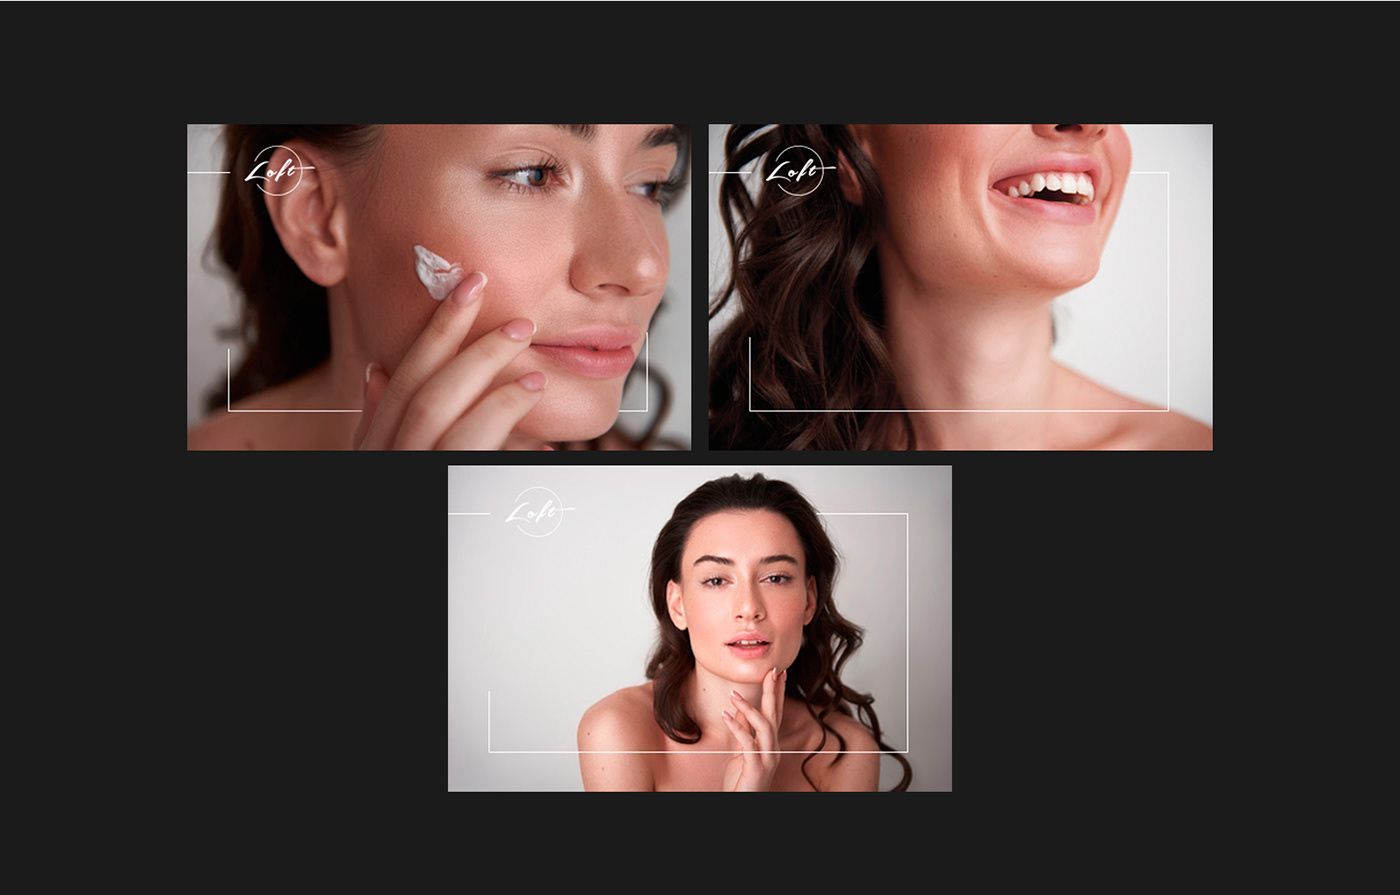 beauty salon logo identivication branding  price list voucher poster